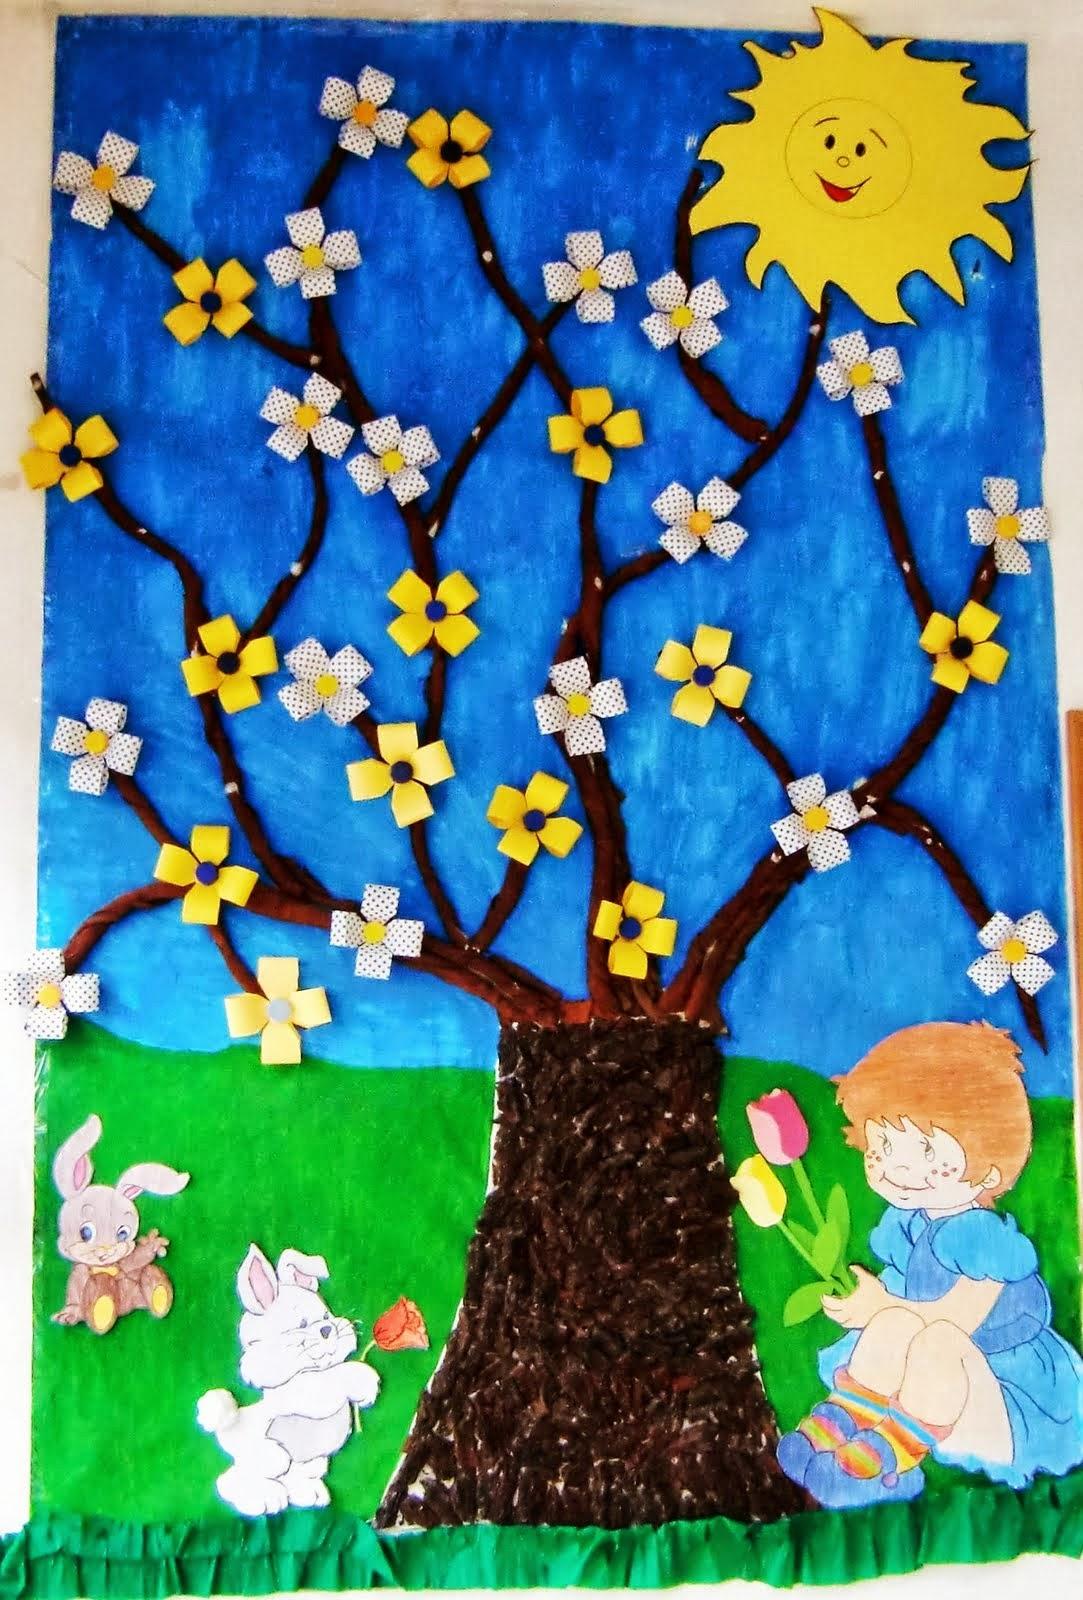 decorar sala de kinder : decorar sala de kinder:Puertar decorar clase (12) – Imagenes Educativas